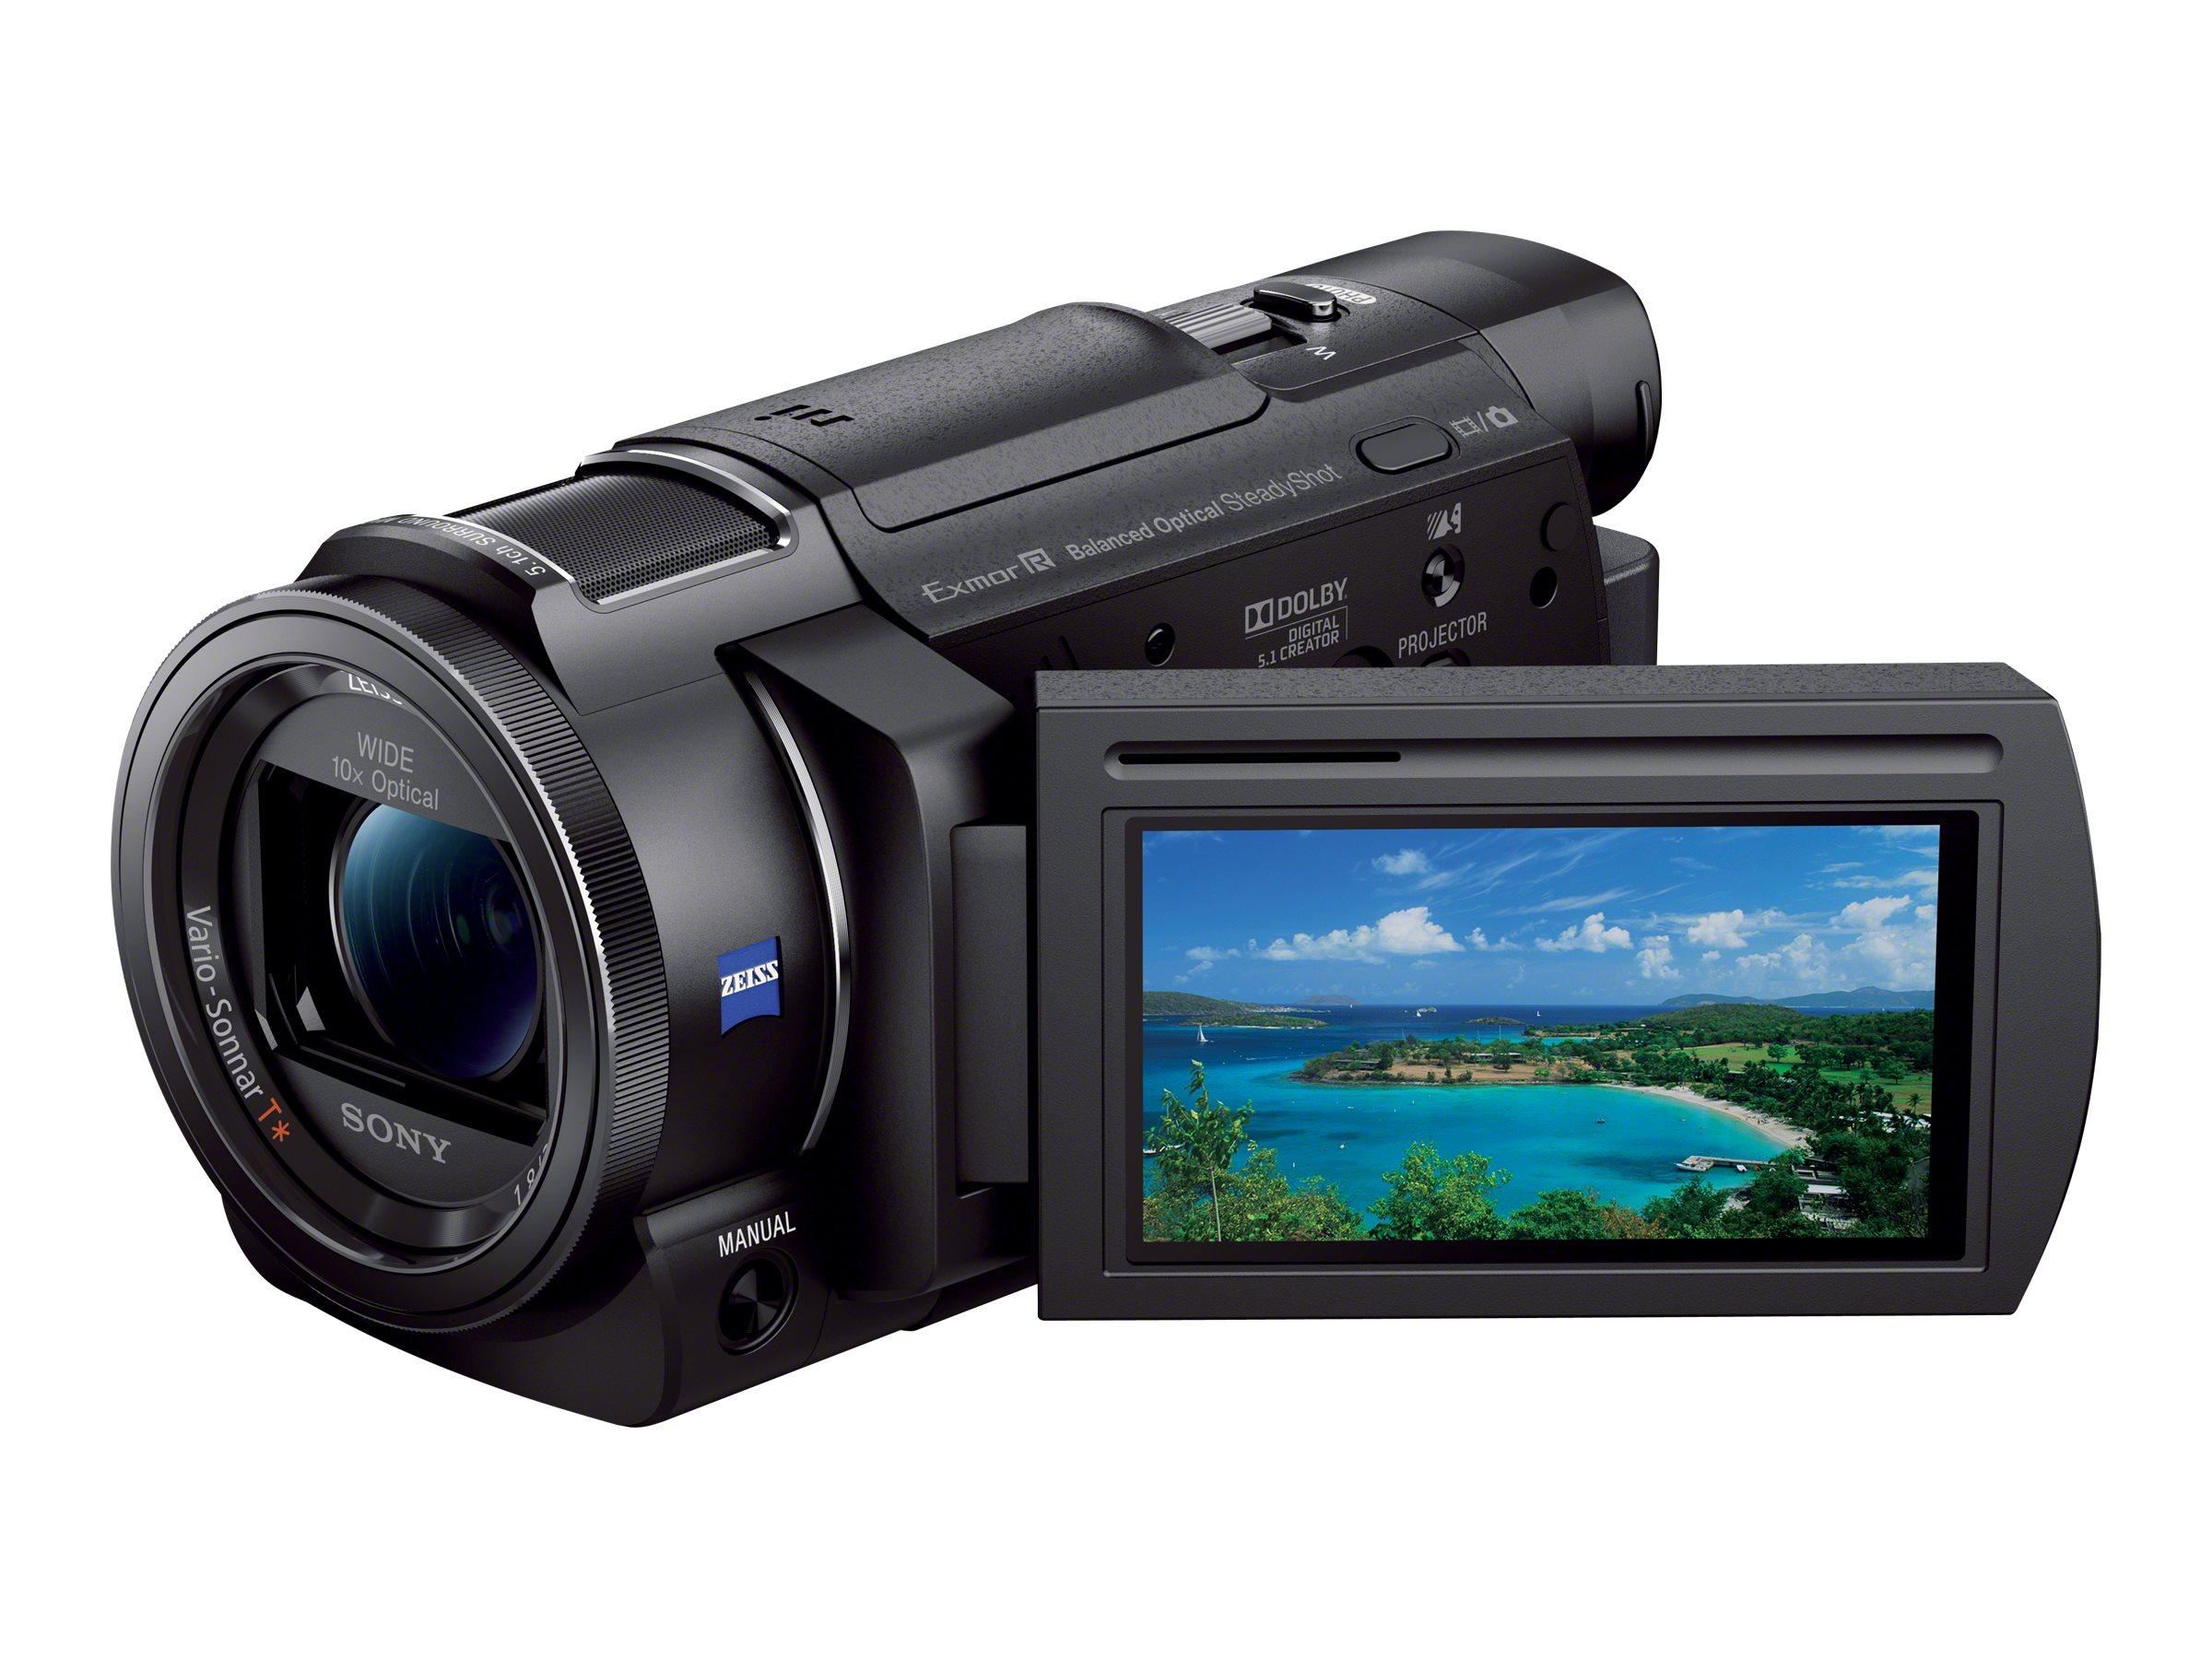 Sony Handycam FDR-AX33 - Camcorder